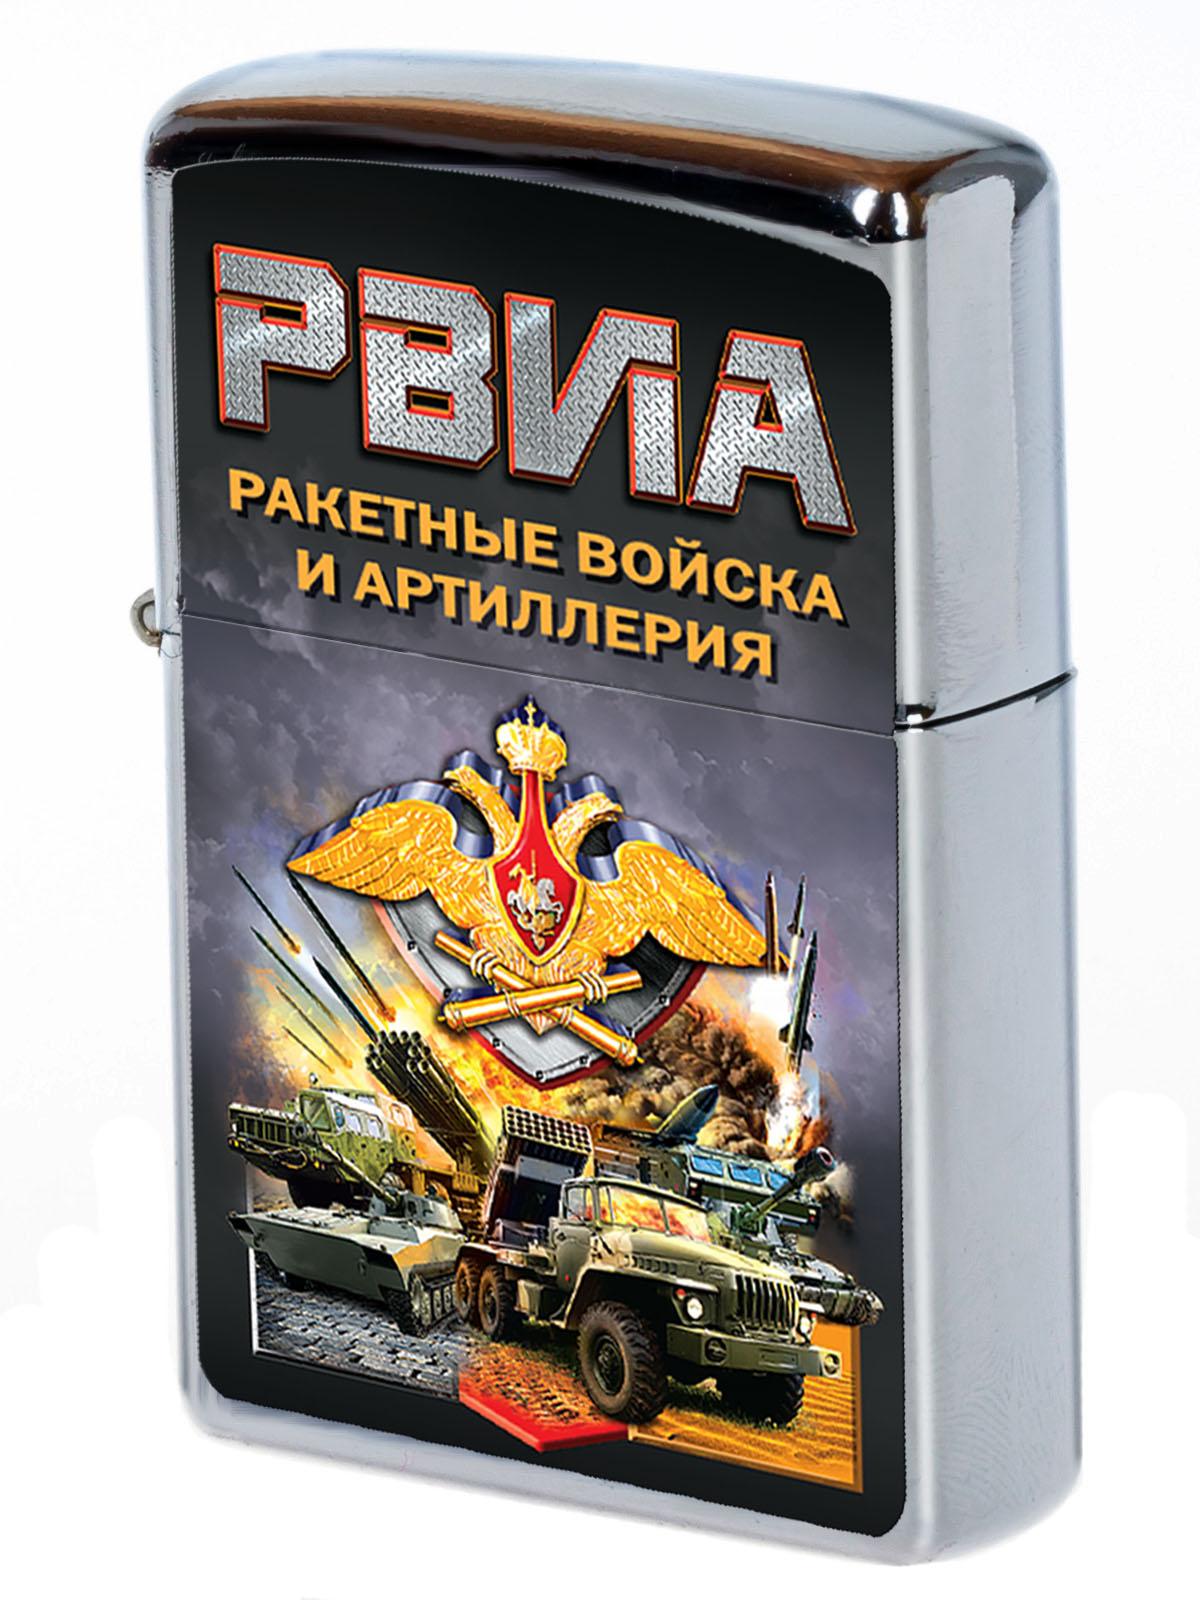 Сувенирная зажигалка РВиА